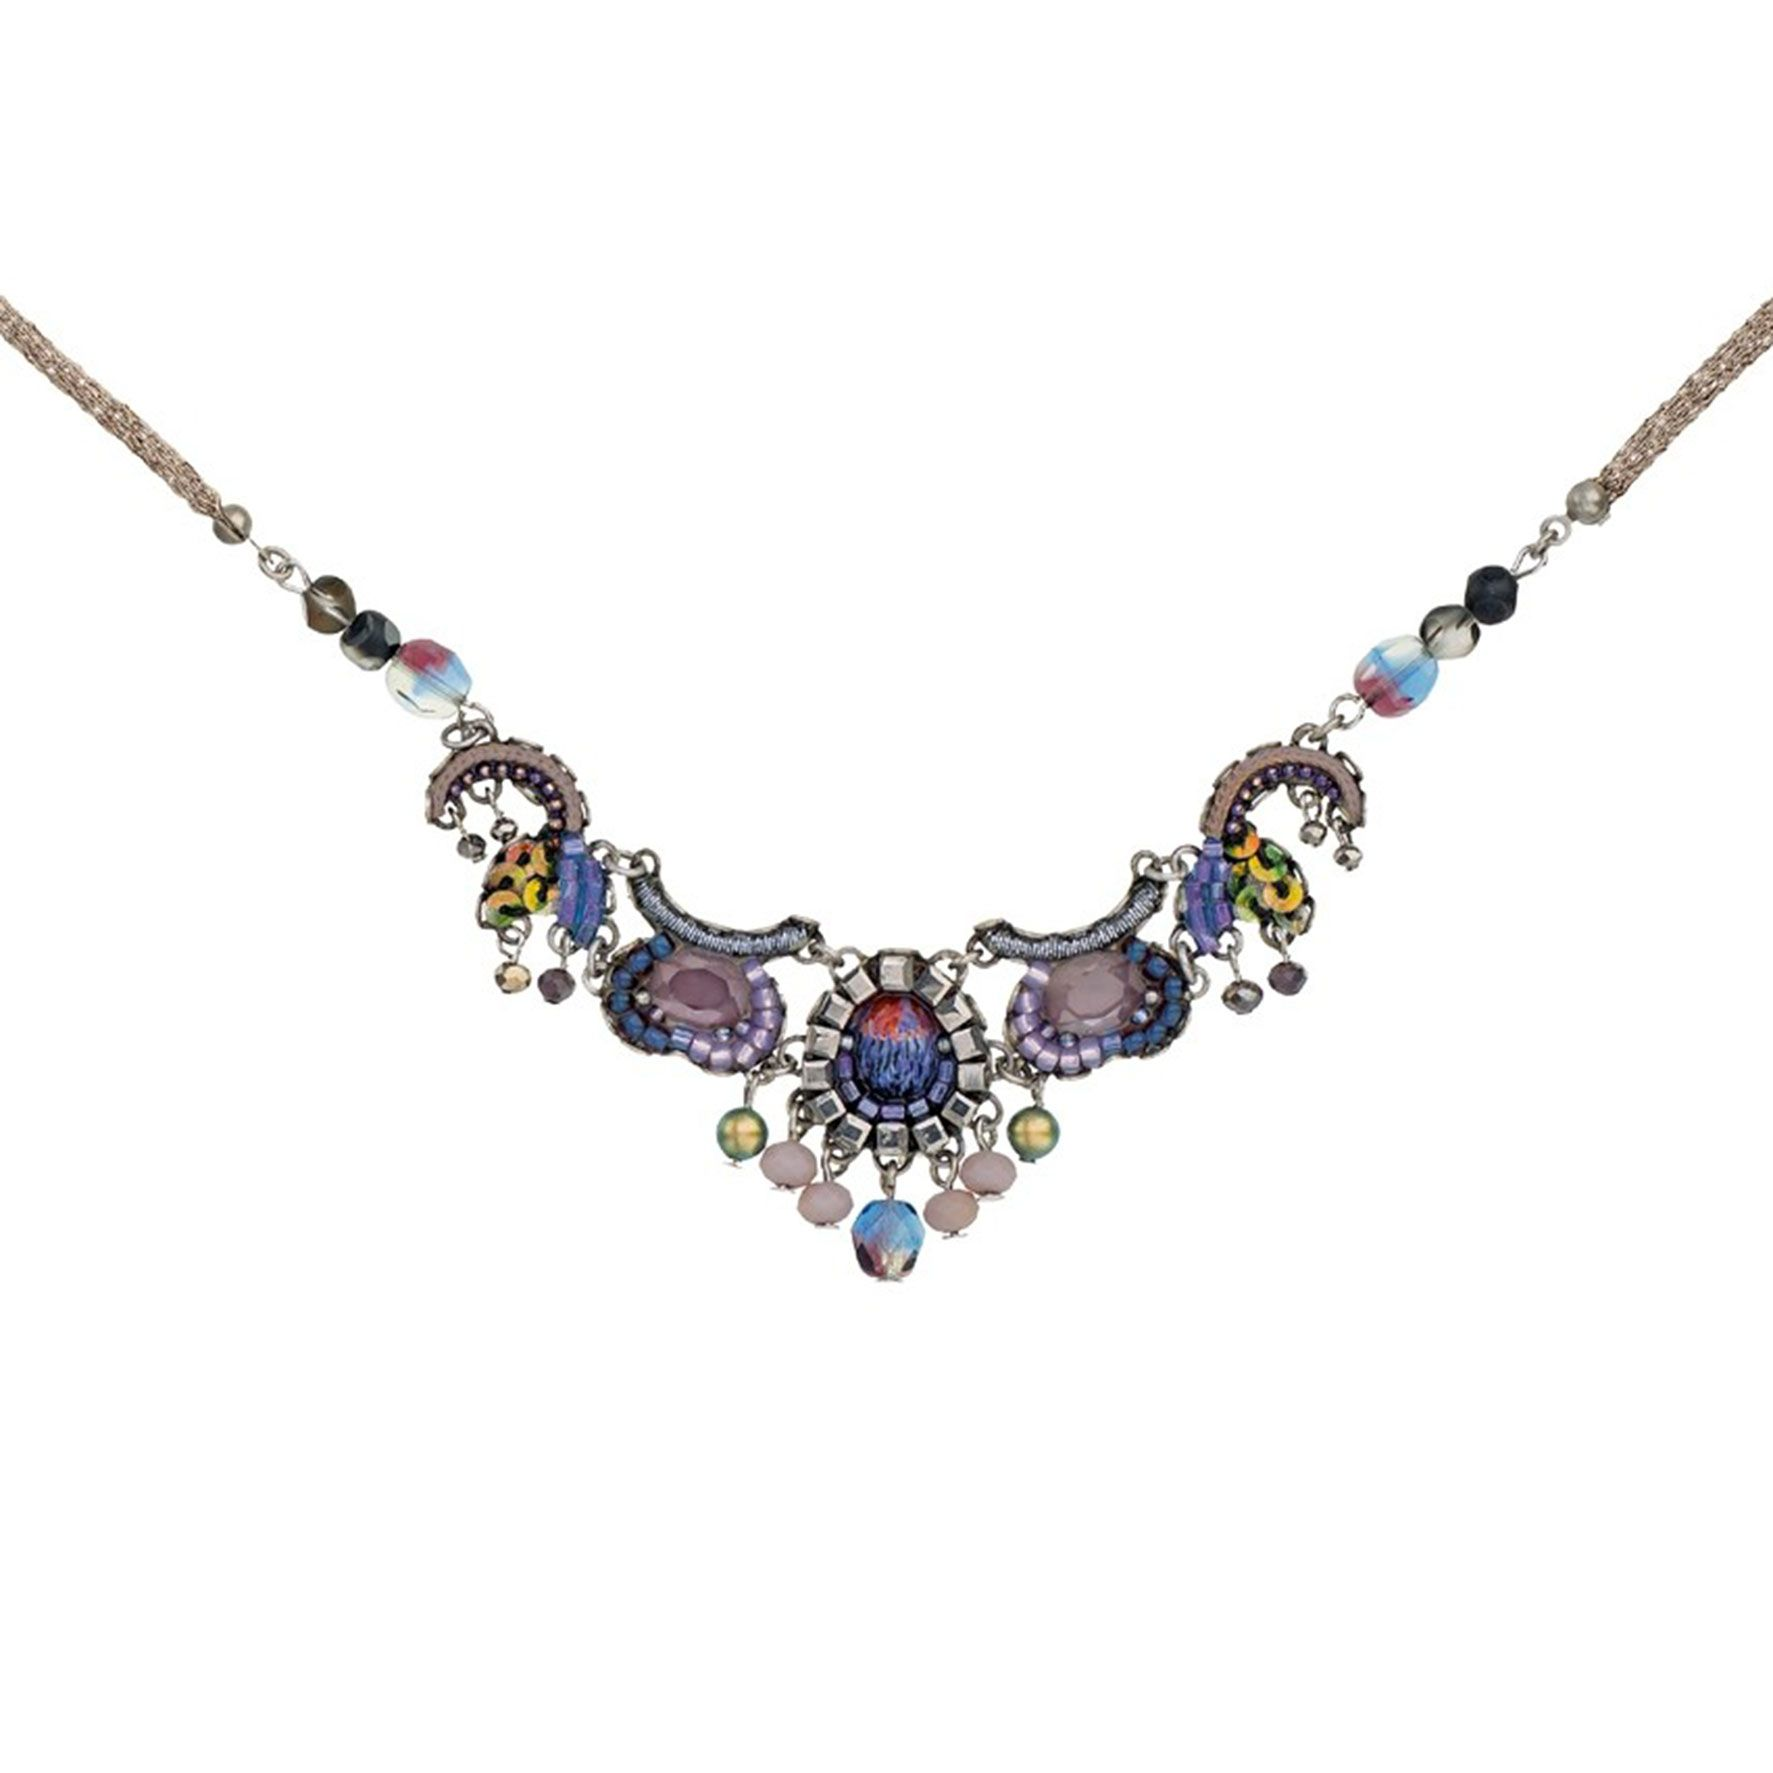 Ayala Bar Israeli Jewelry - Clear Sky Padanaran Necklace - Fall/Winter 2018